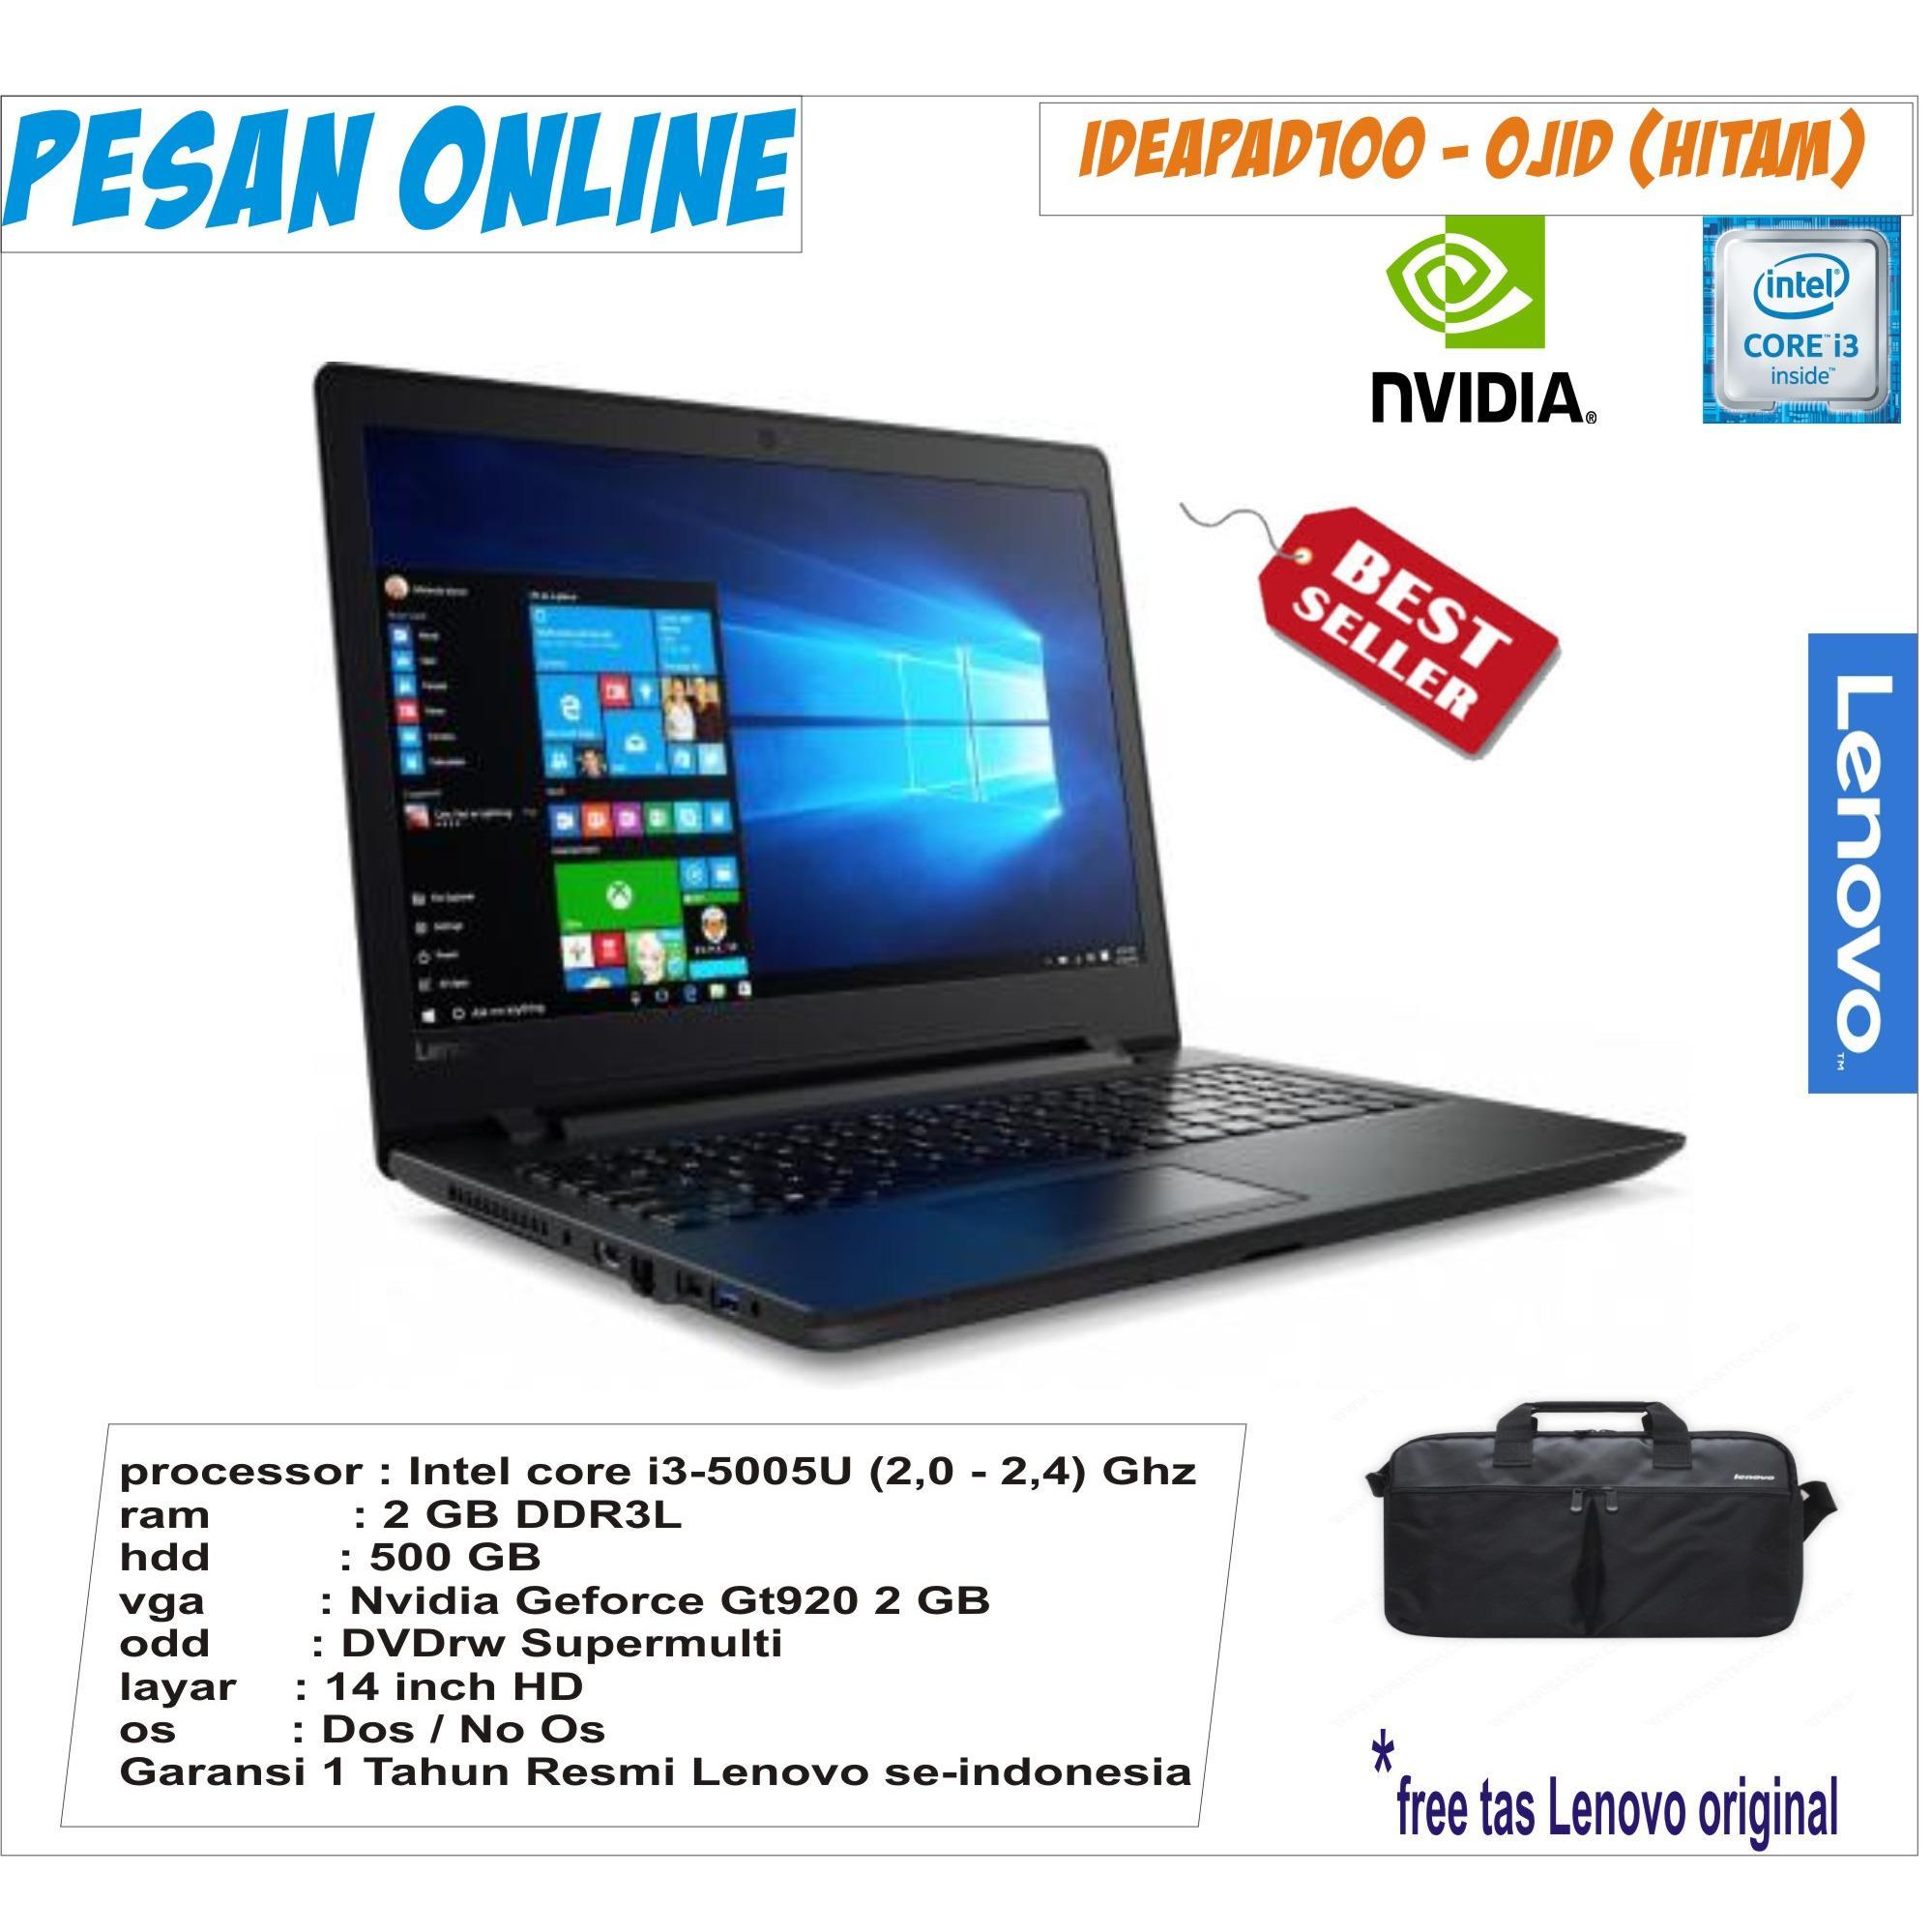 lenovo ideapad100 core i3/ ram 2 gb/ 500 Hdd/14 Inch hd/dos/ garansi resmi lenovo indonesia